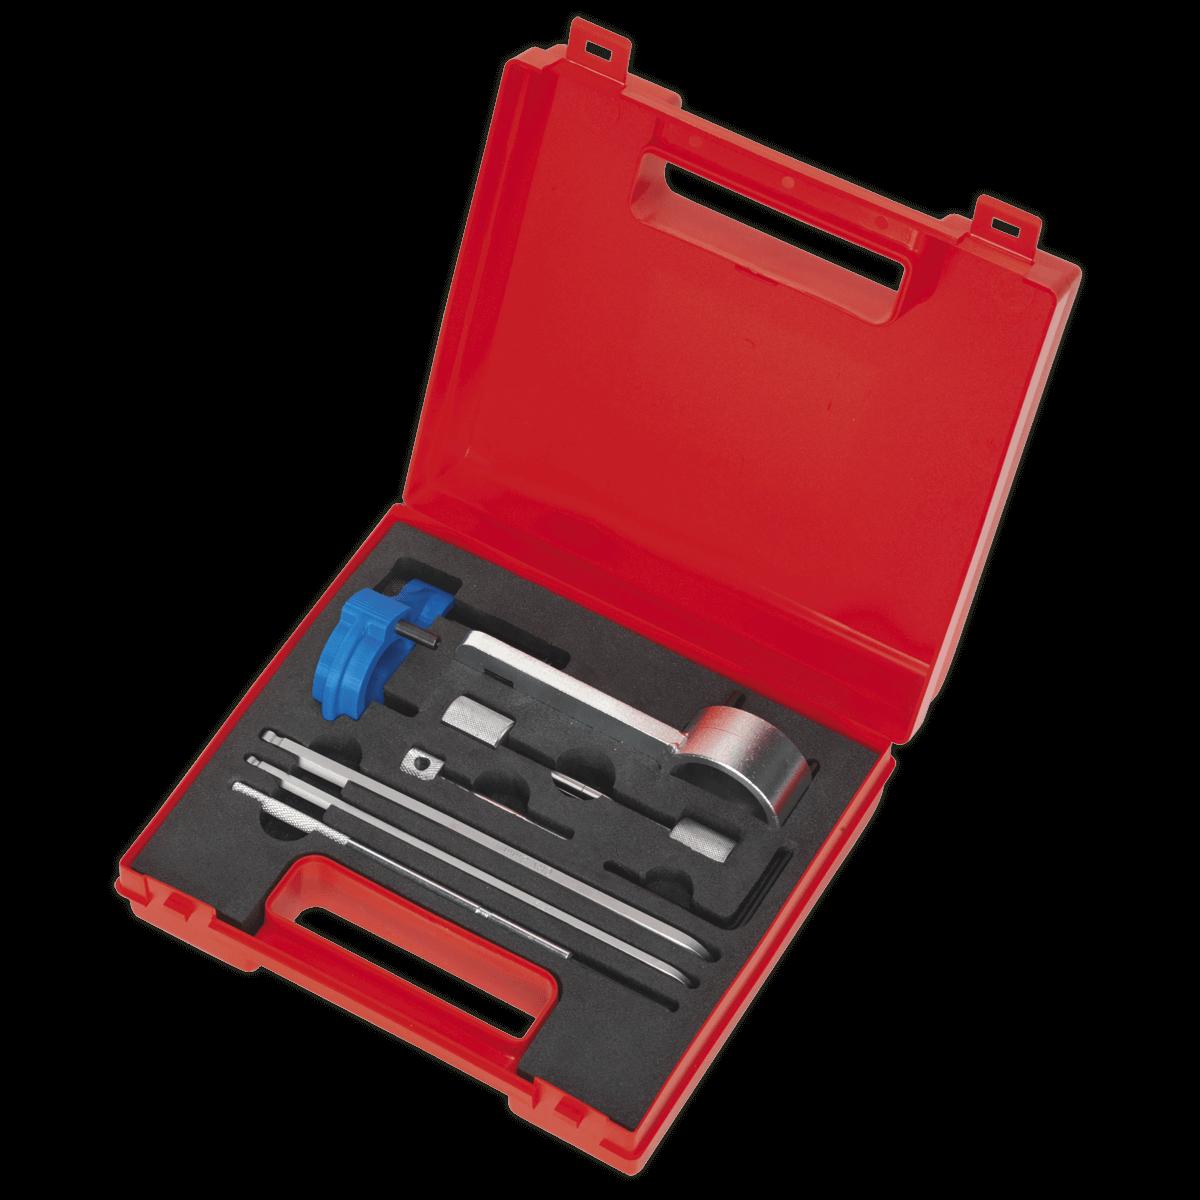 Sealey VS5170 Diesel Engine Setting/Locking Kit - Vag 1 4, 1 6, 2 0